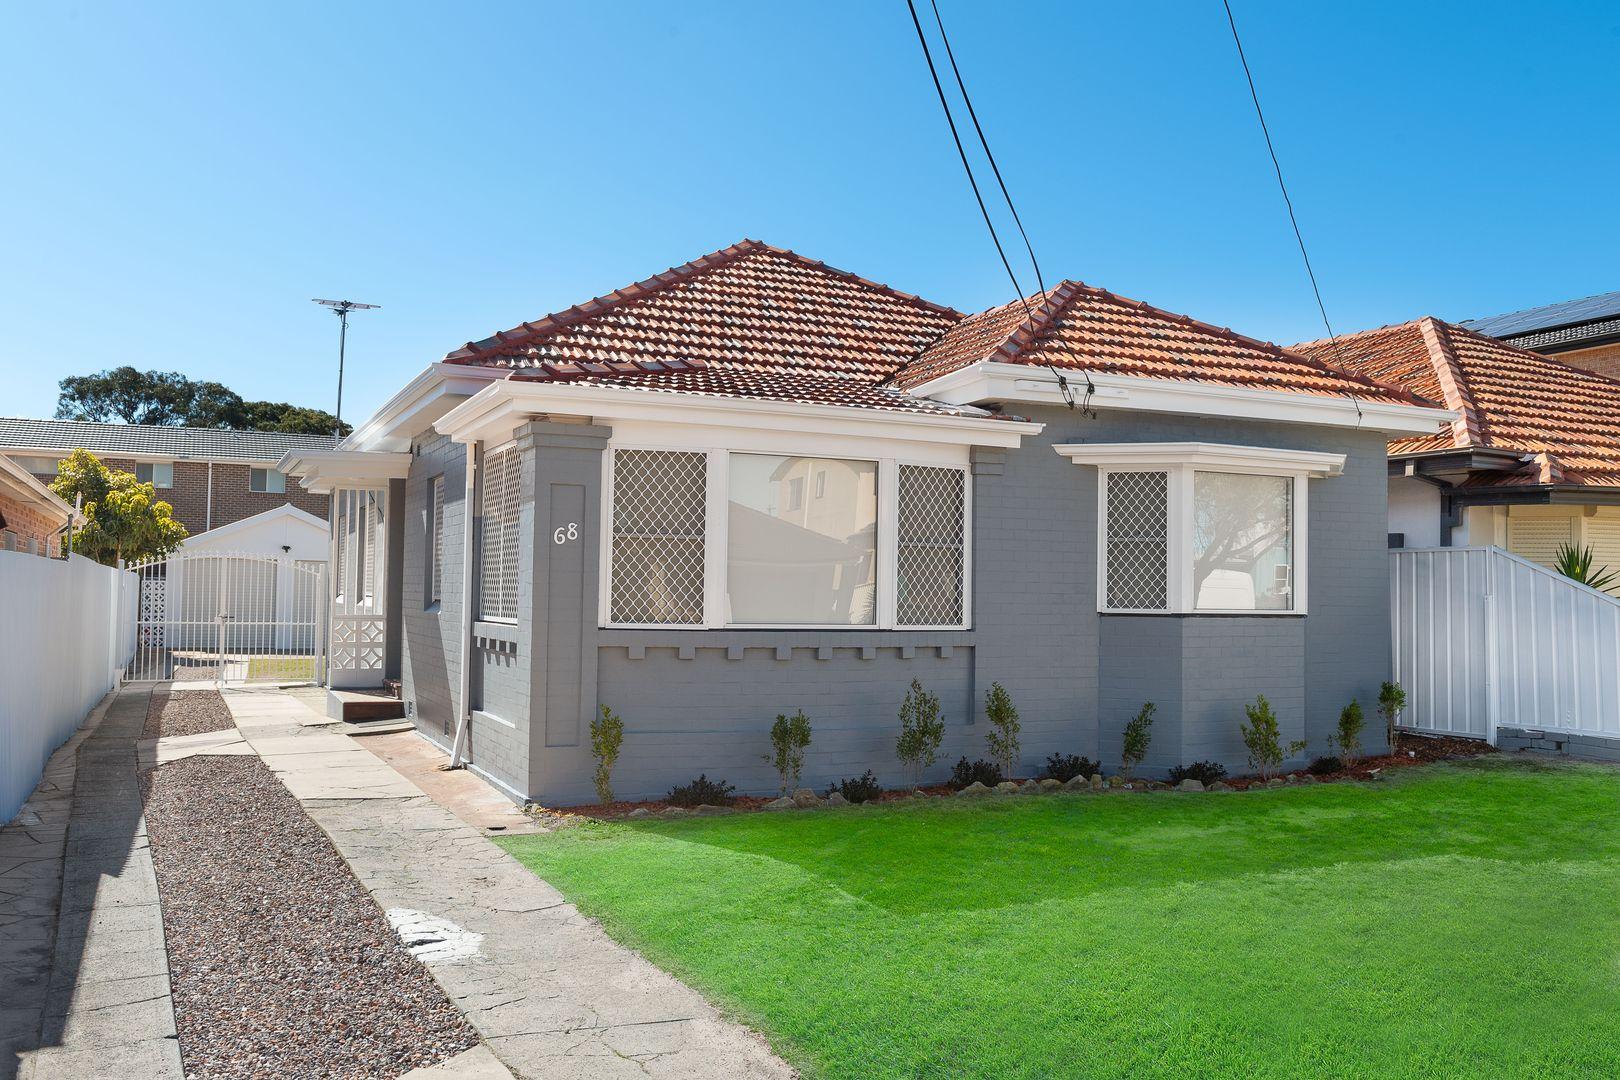 68 Sandringham Street, Sans Souci NSW 2219, Image 1